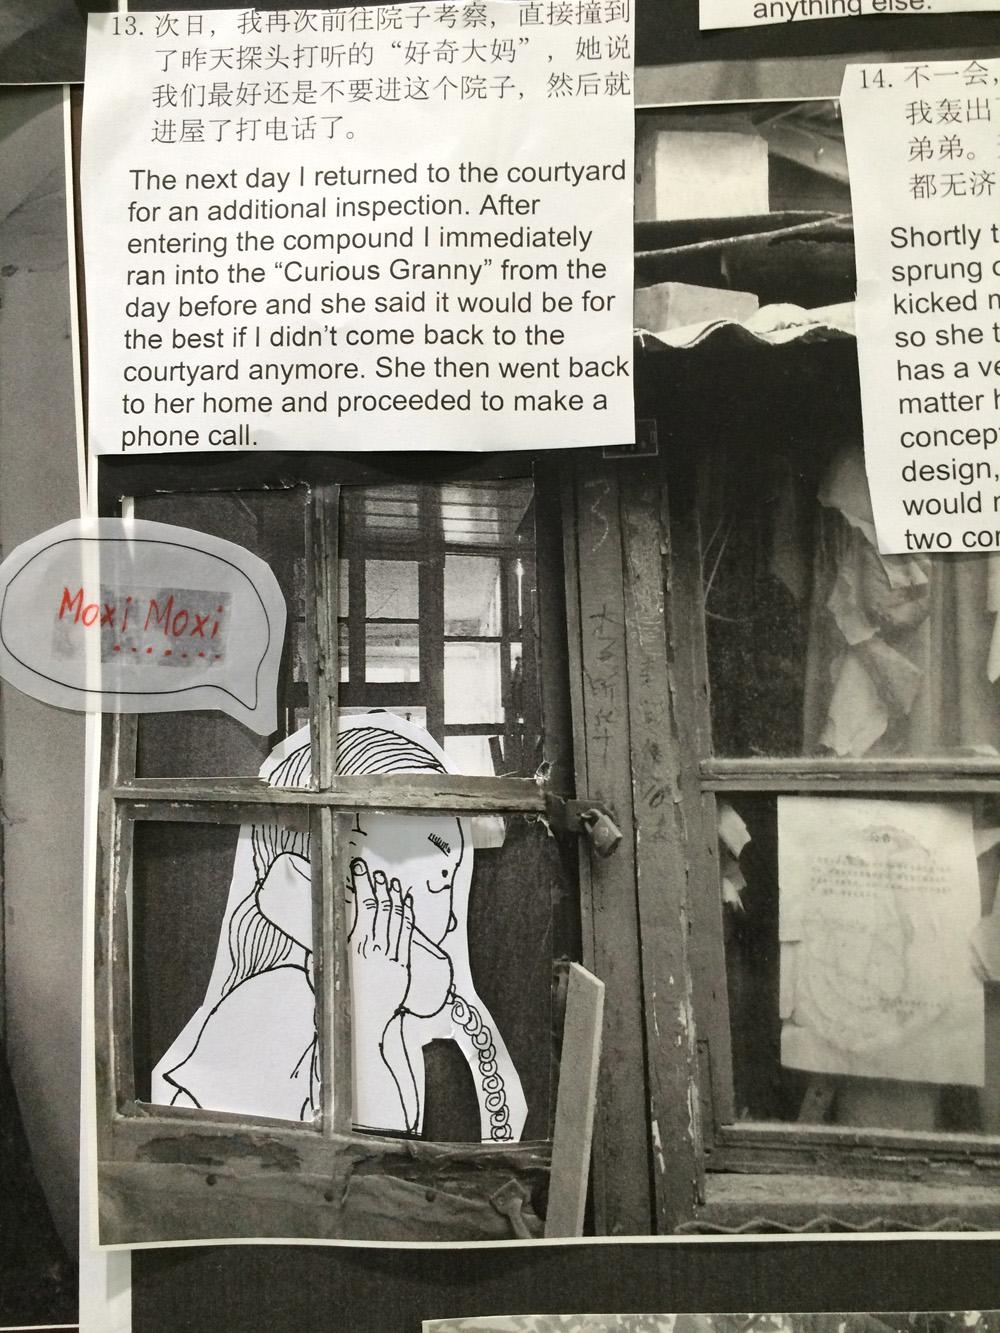 Caopu-humble-hostel-story-hisheji (13)